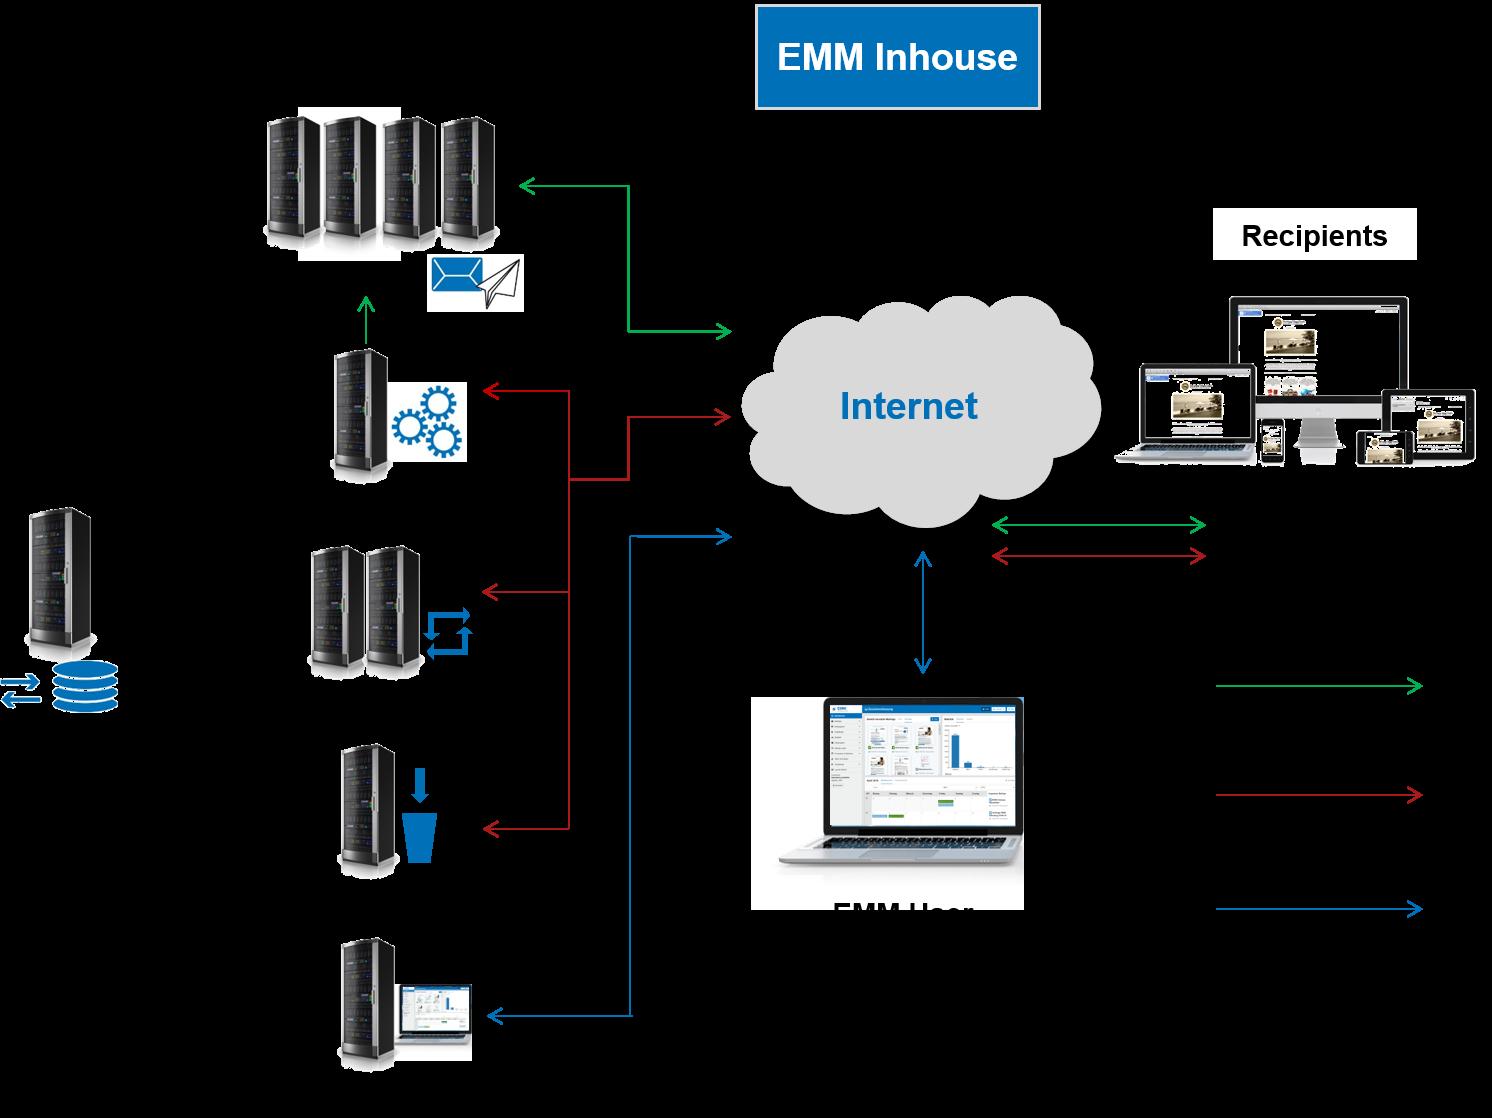 Scheme of system landscape EMM Inhouse